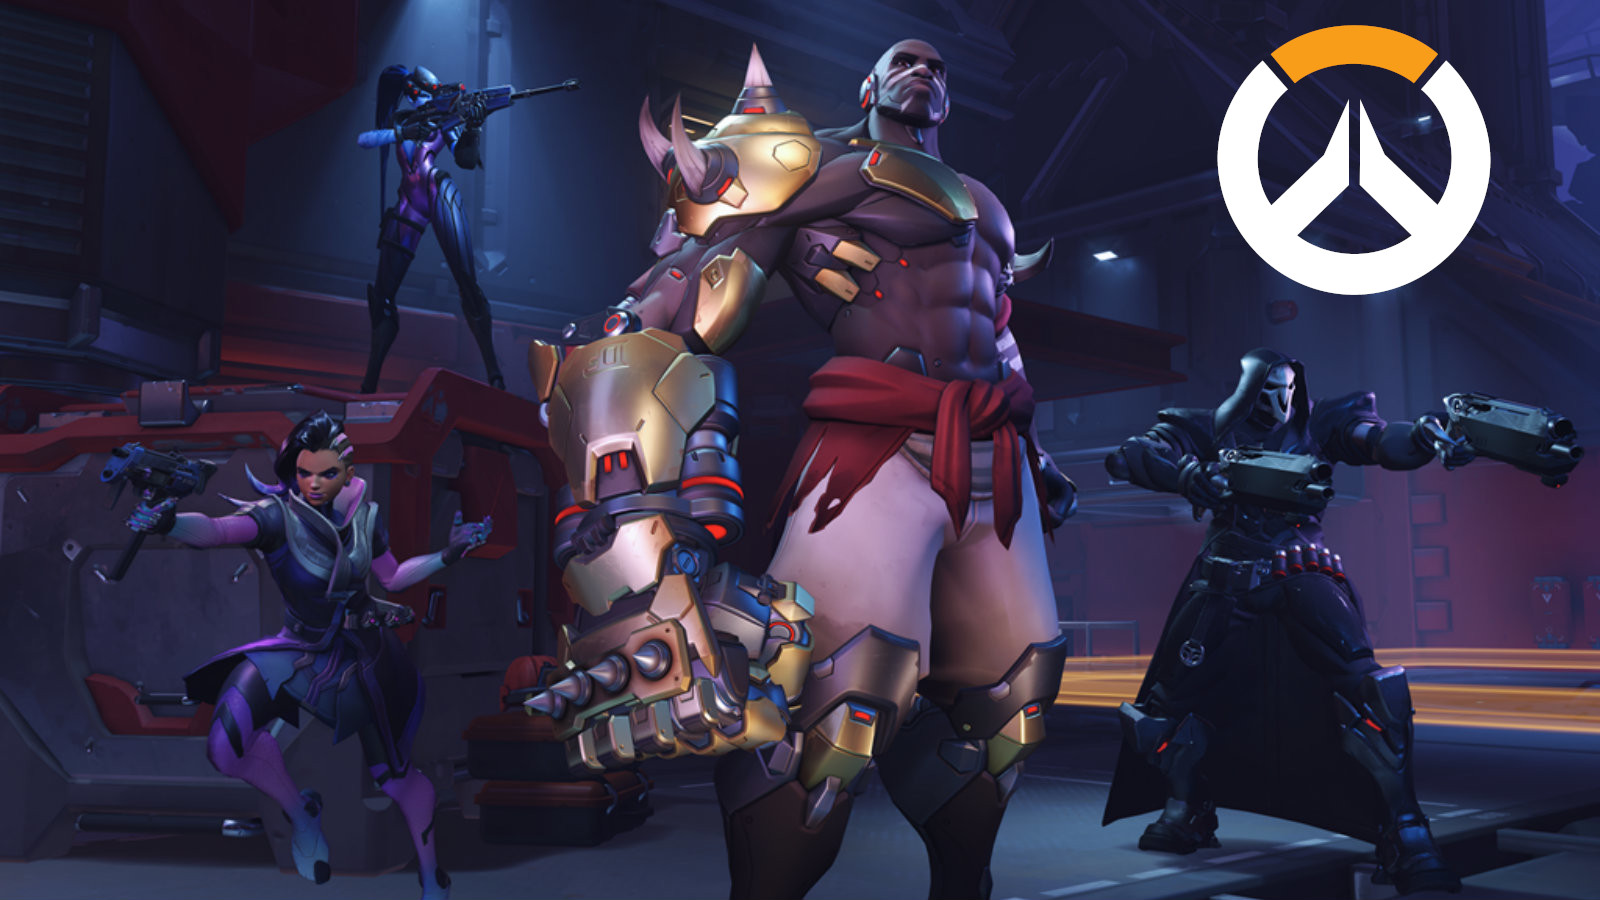 Overwatch Talon members Sombra, Doomfist, Reaper and Widowmaker